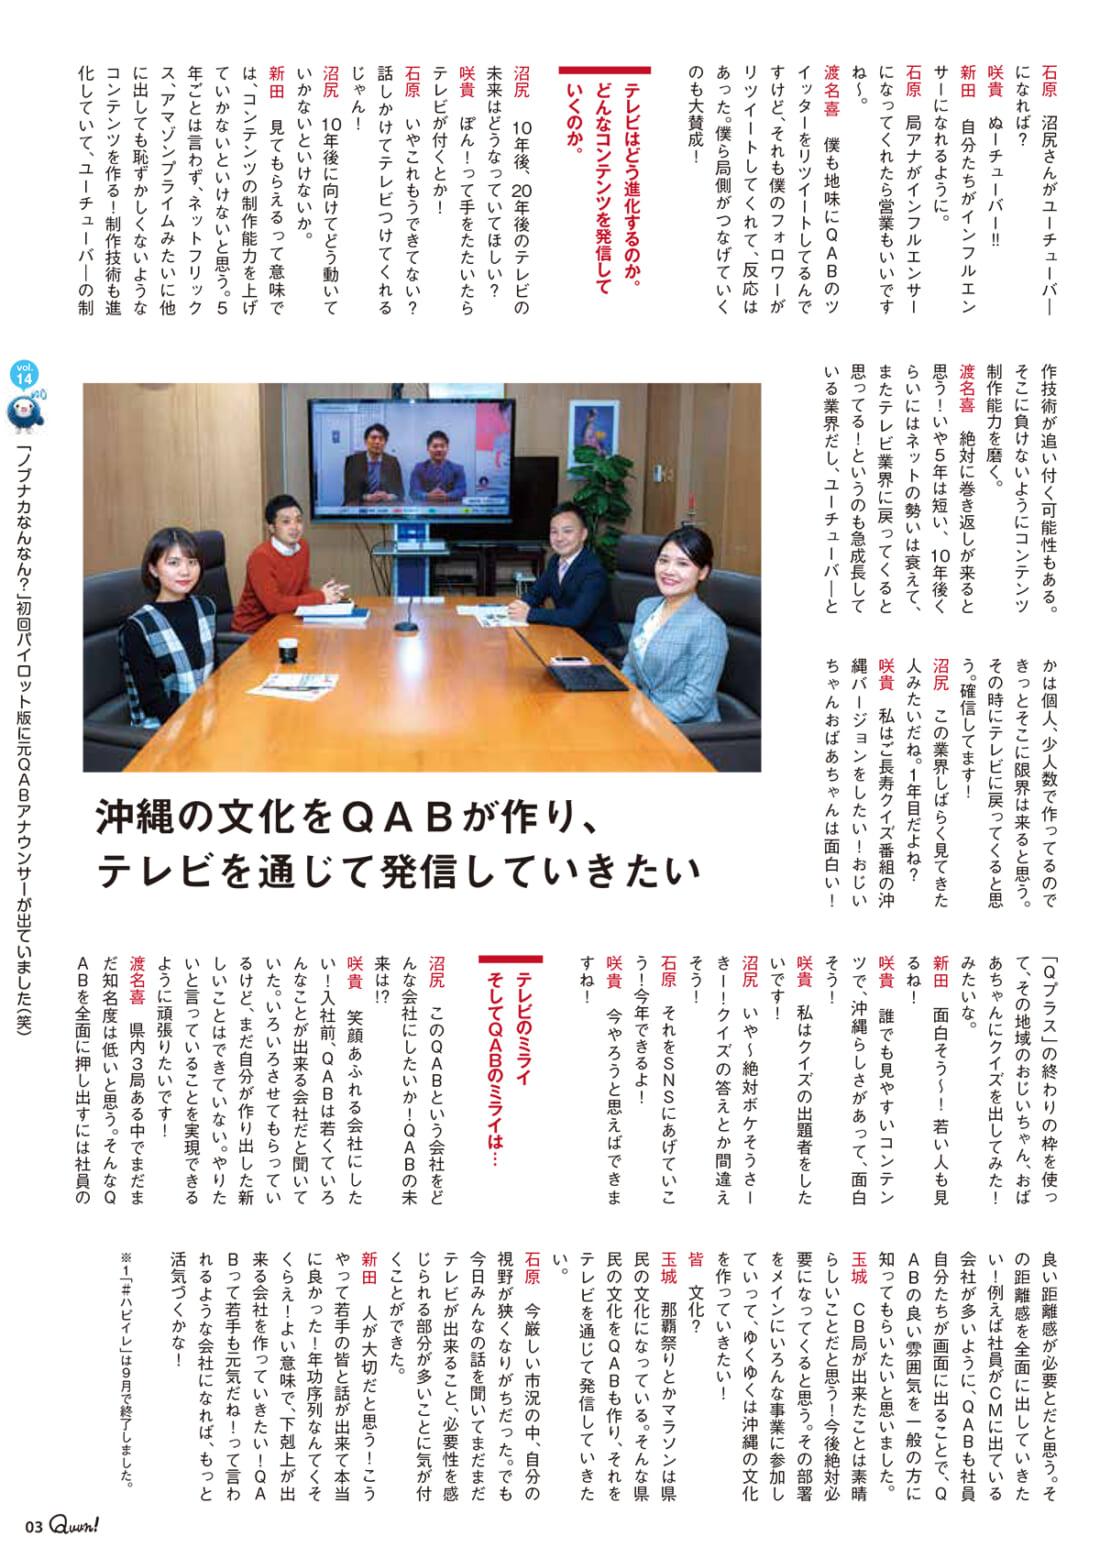 https://www.qab.co.jp/qgoro/wp-content/uploads/quun_1405-1100x1558.jpg